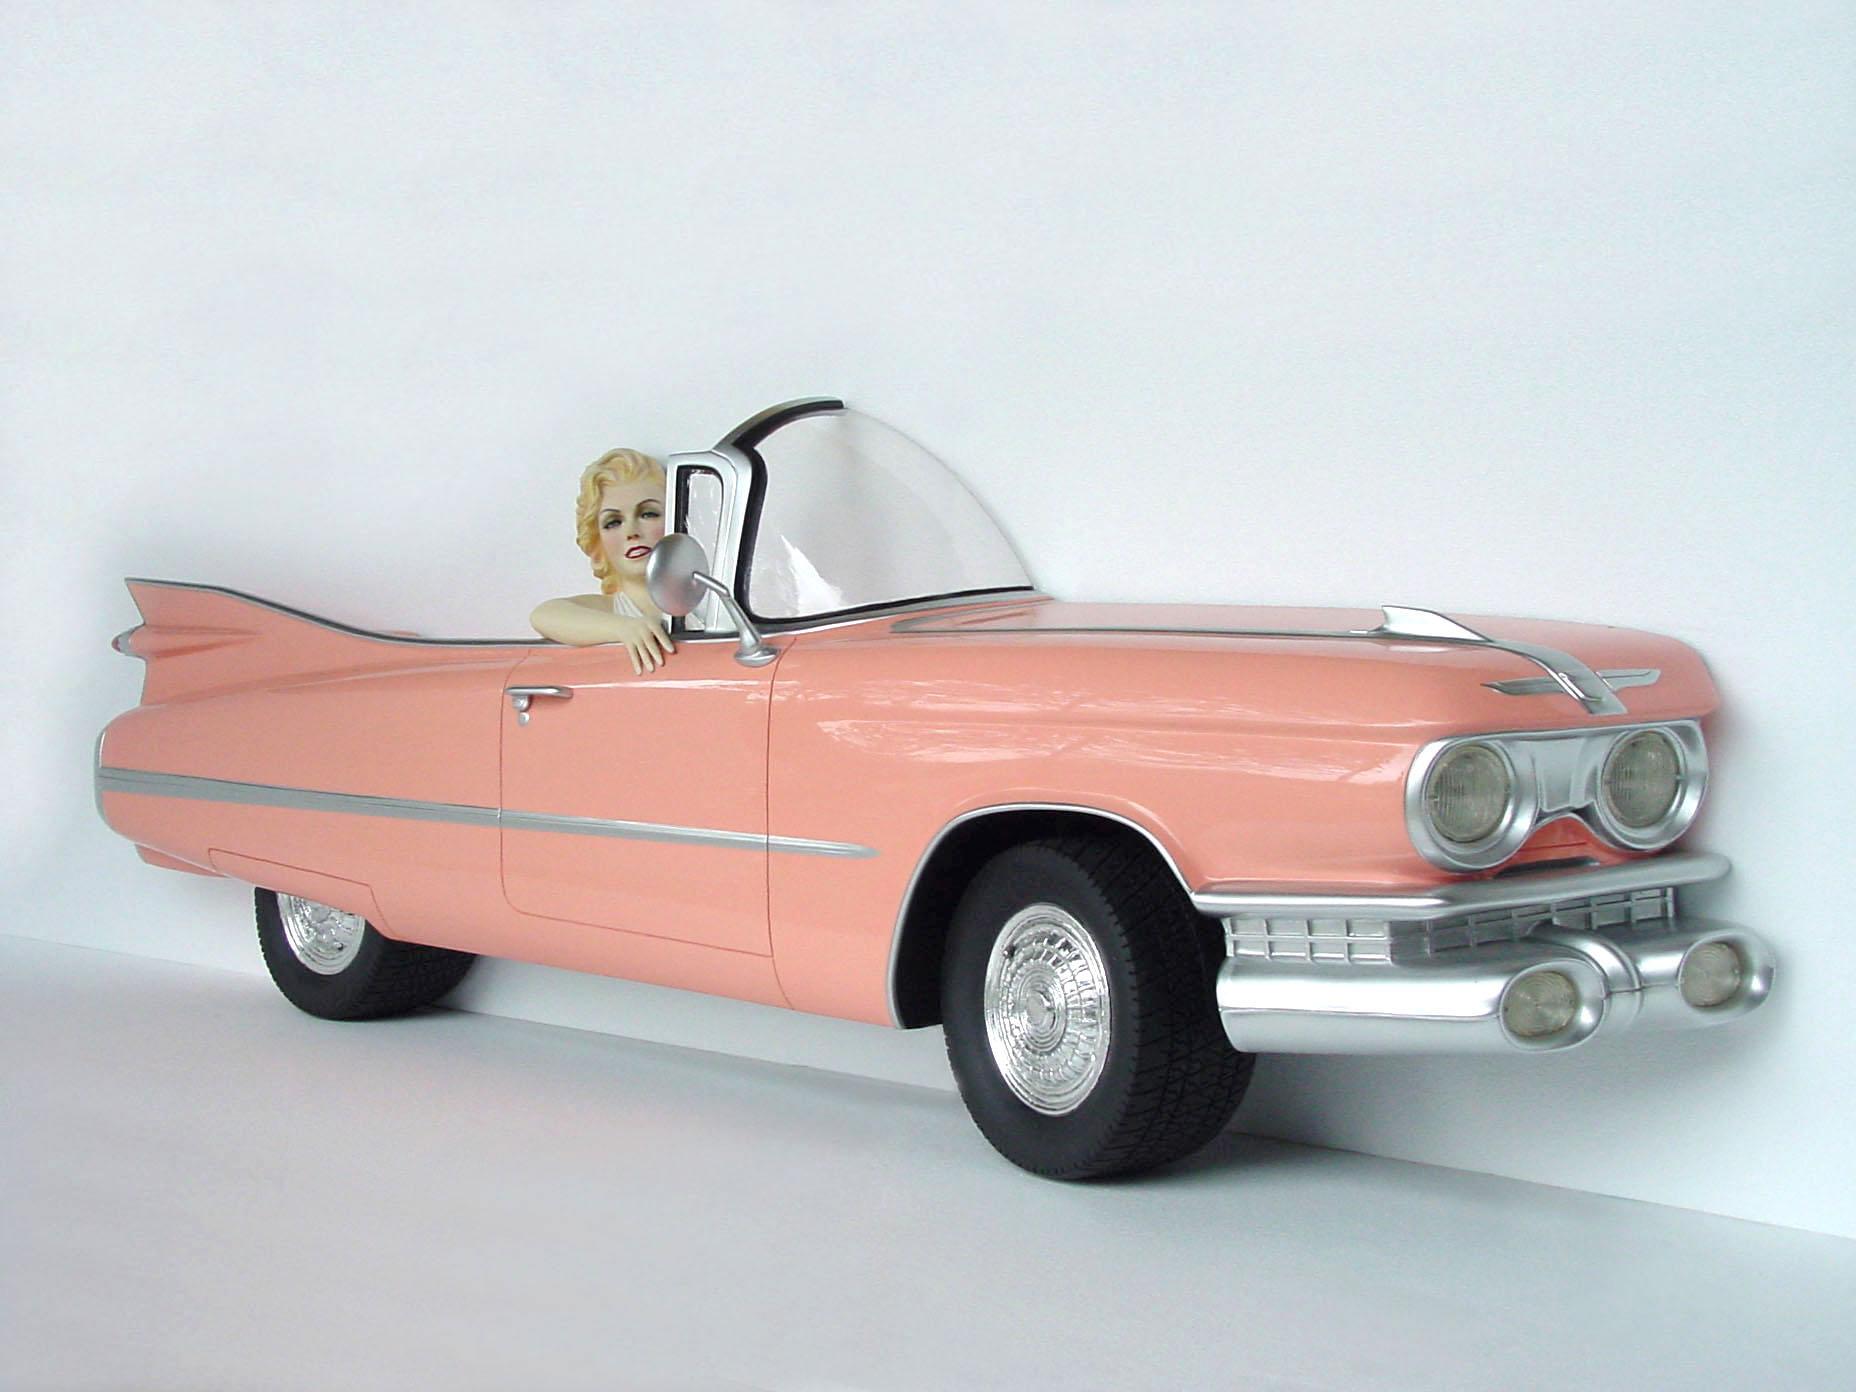 Amazing Pink Cadillac Car Wall Decor With Actress